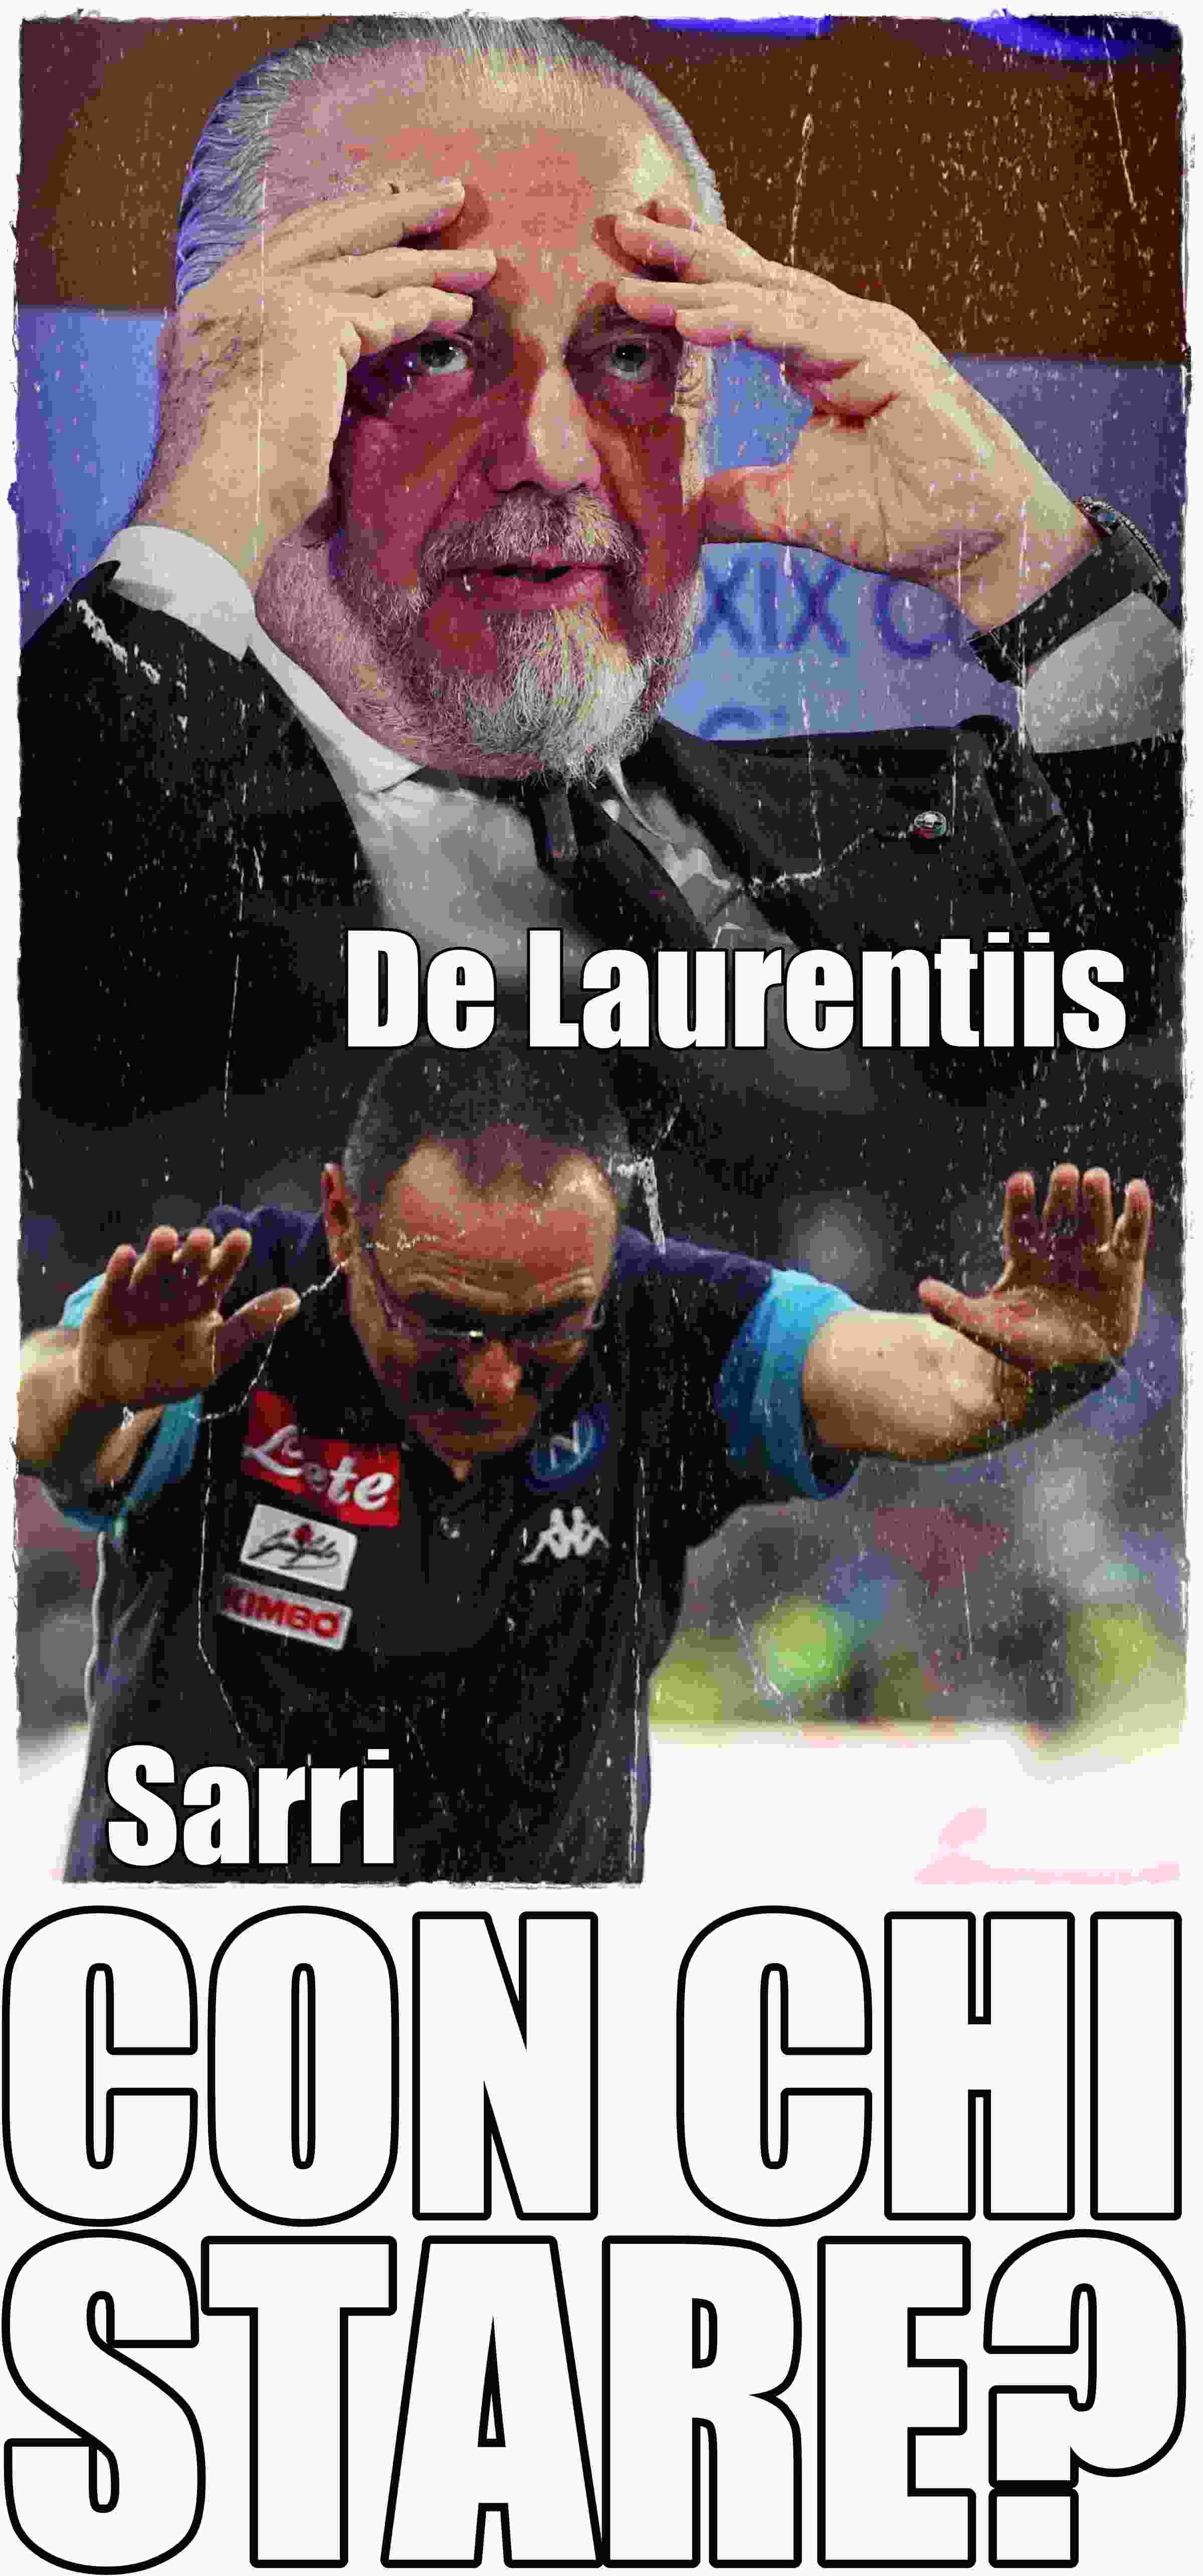 De Laurentiis Sarri Napoli Crotone 1